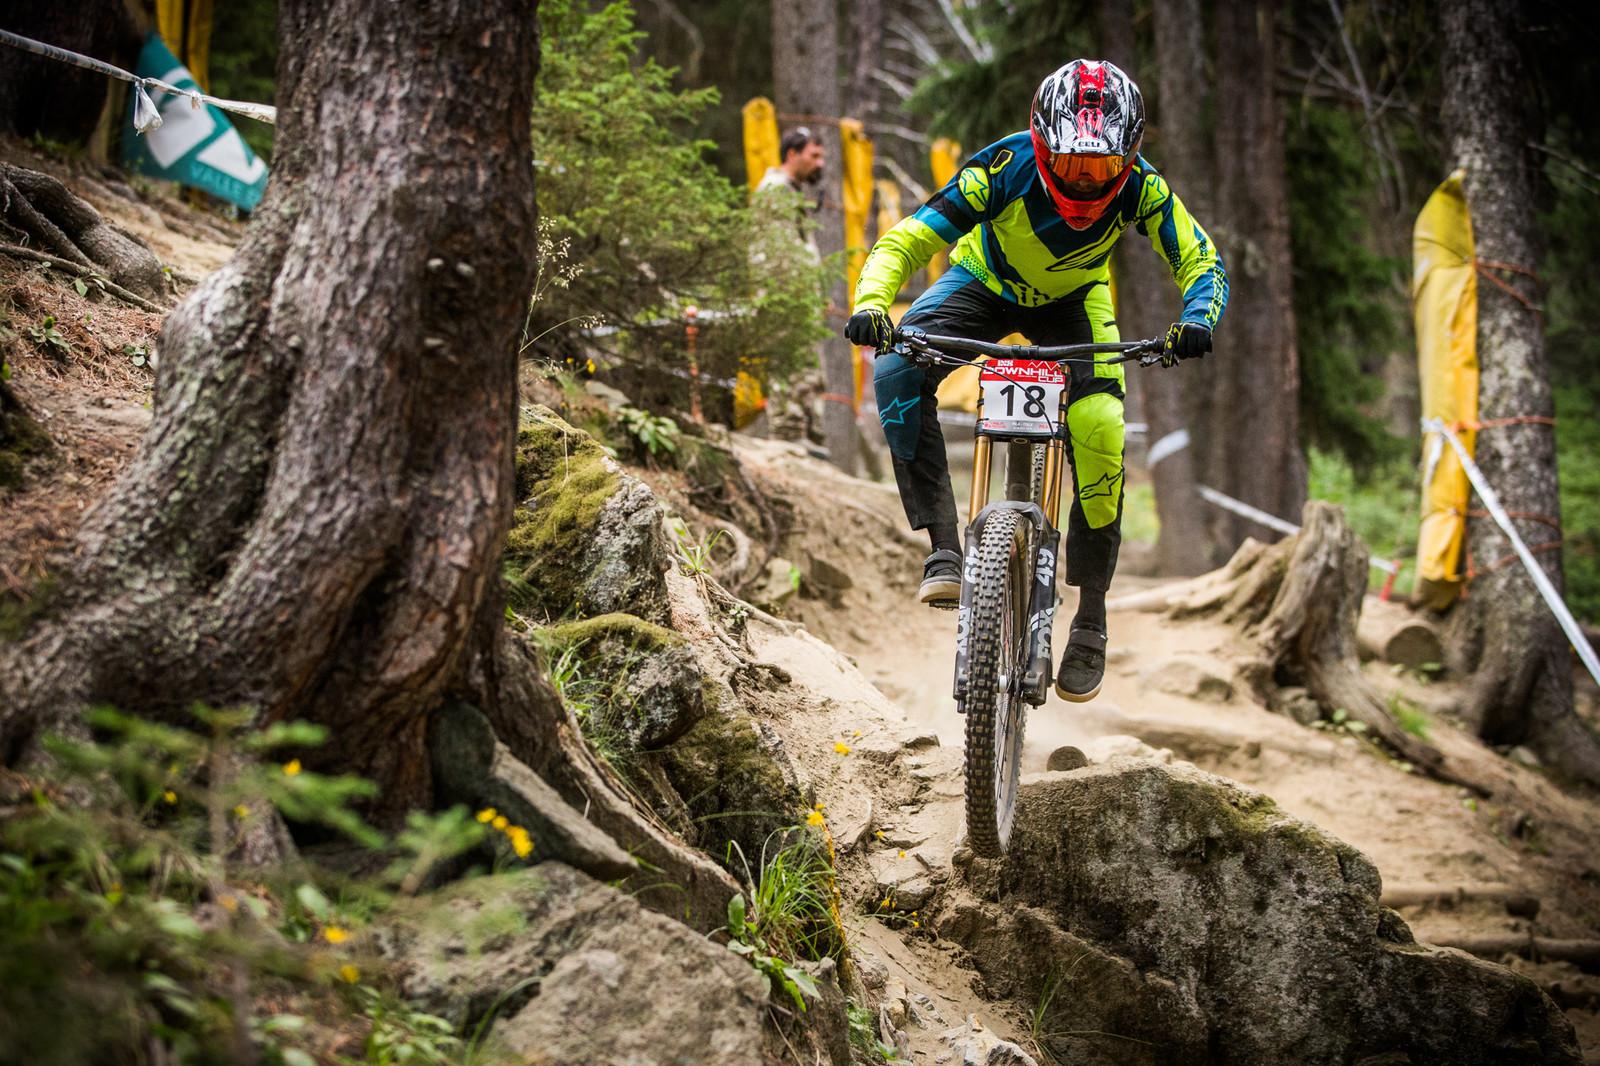 Christopher Philogene - iXS Downhill Cup Pila - Race Gallery - Mountain Biking Pictures - Vital MTB